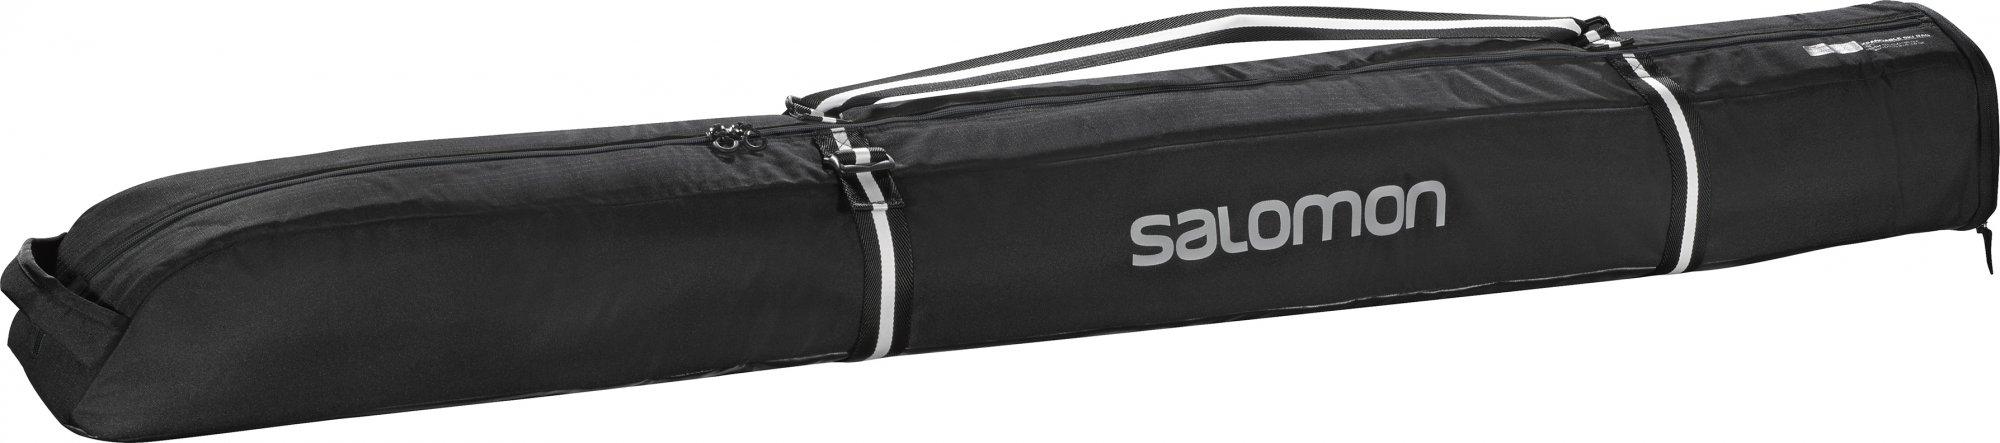 Salomon Extend Padded Ski Bag, 1 pair